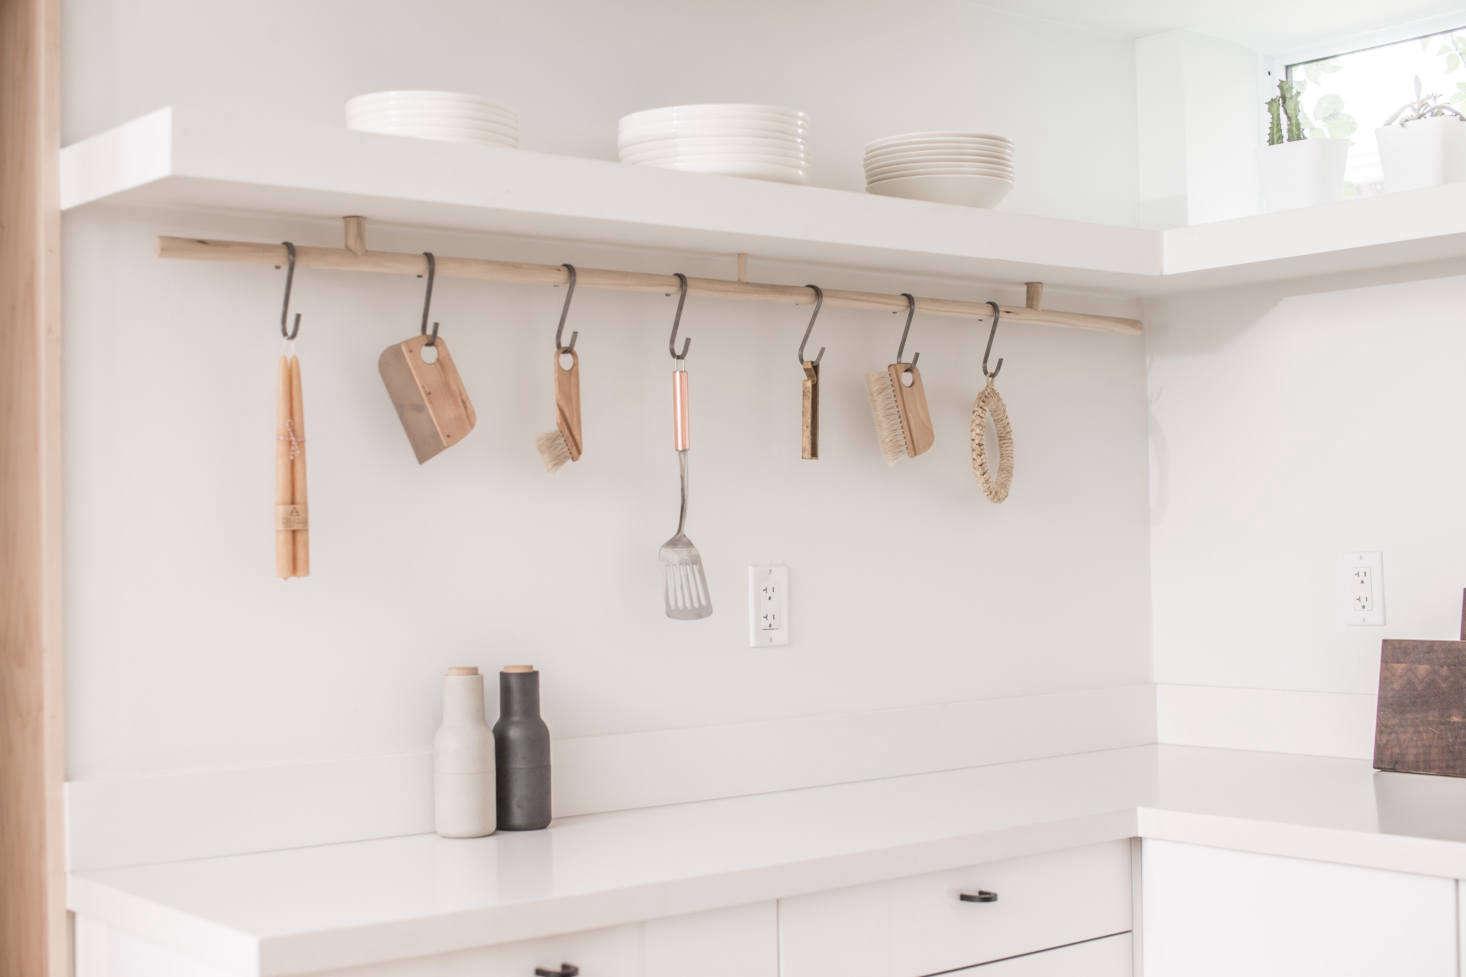 A custom wood rod and S hooks provides hanging storage.